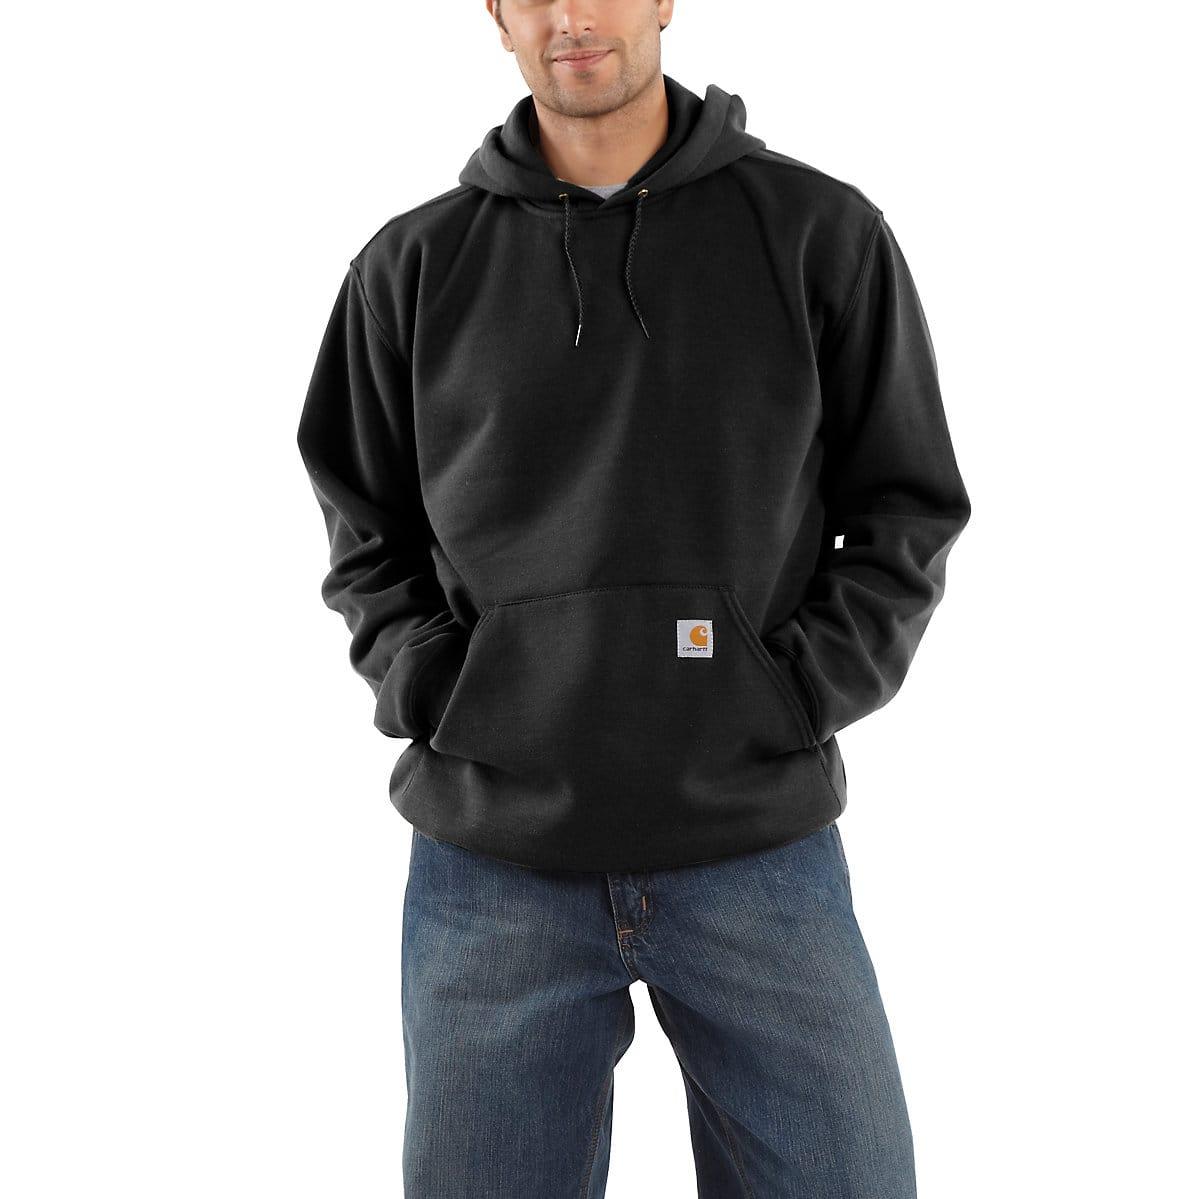 Carhartt Mens Original Fit Midweight Hooded Rugged Workwear Graphic Sweatshirt